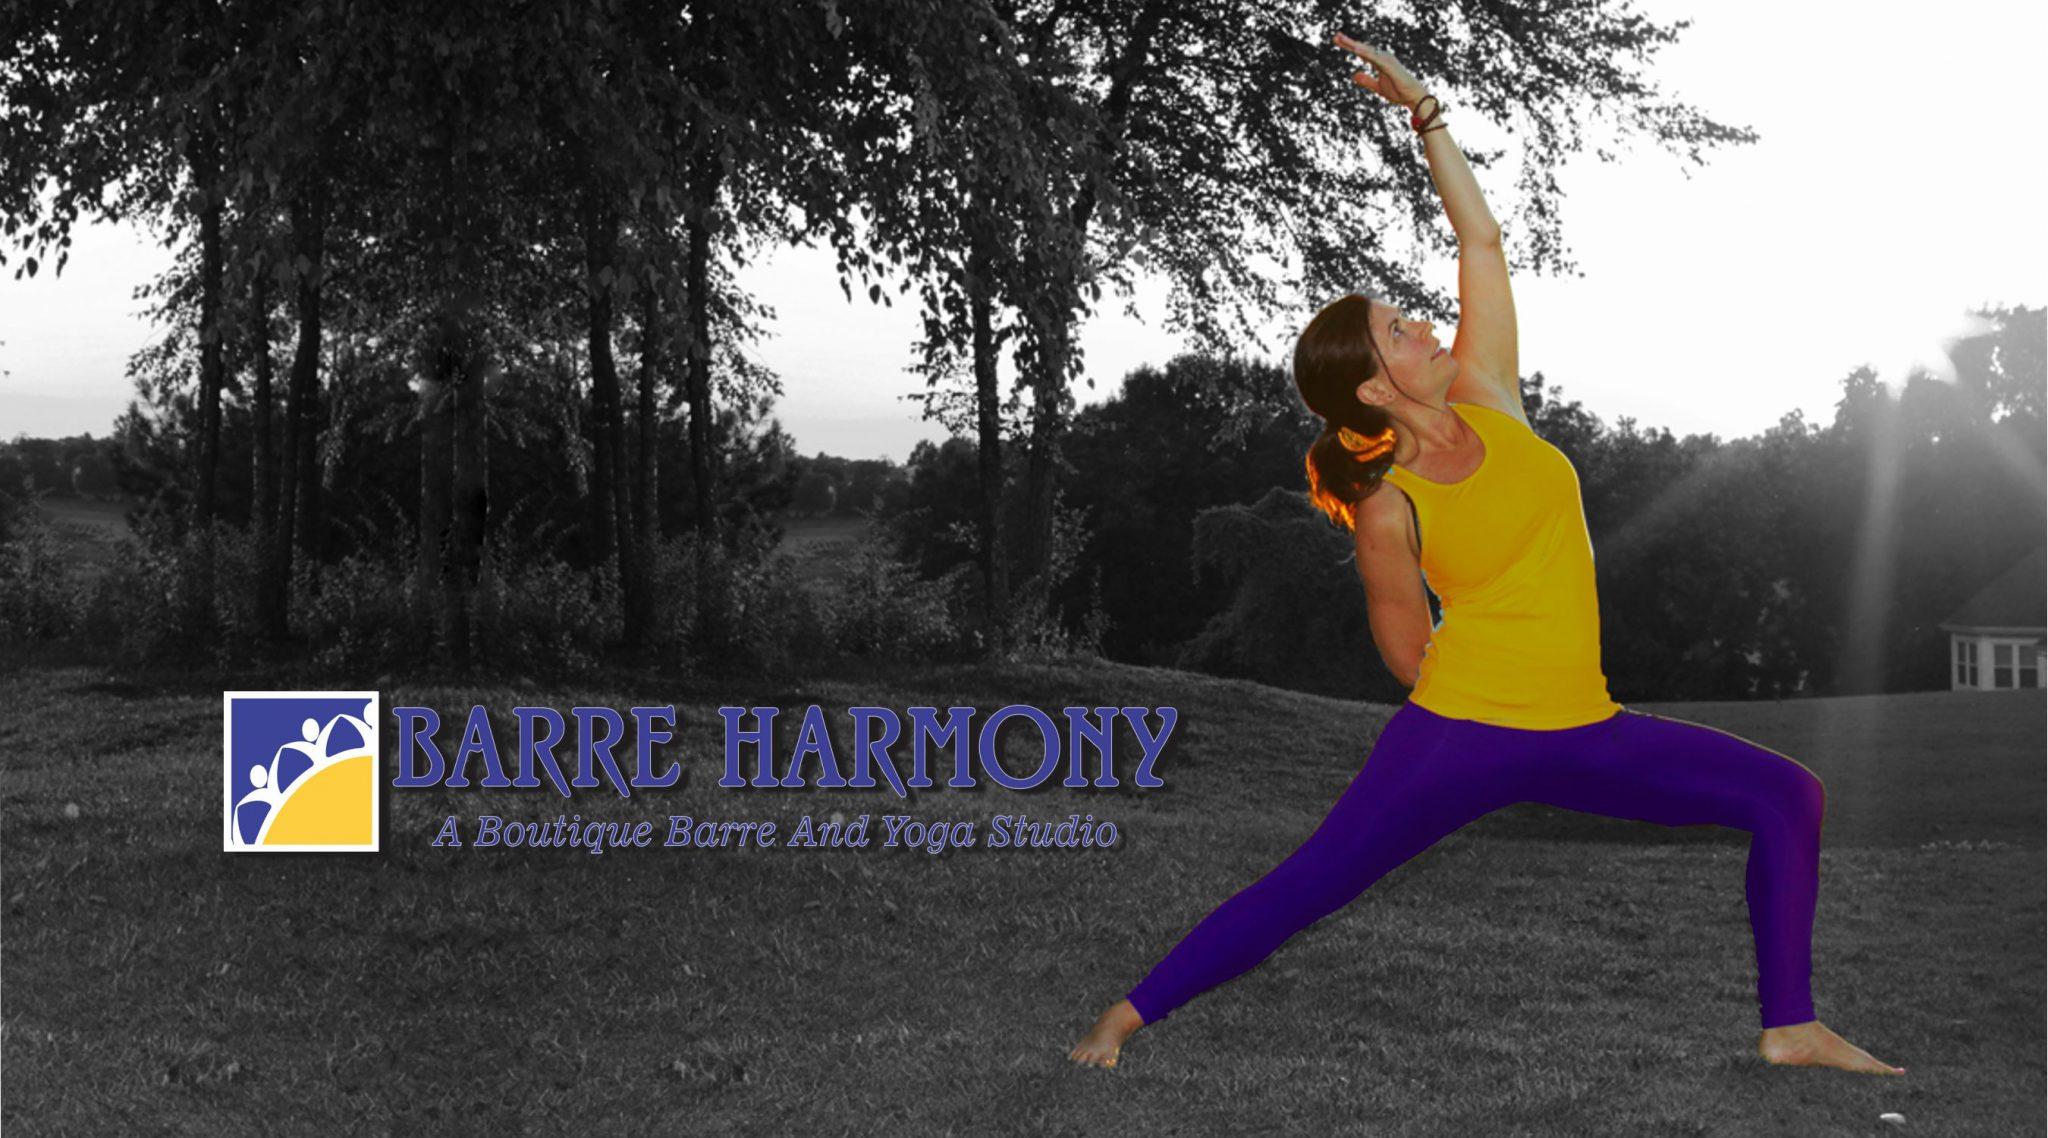 Barre Harmony Home page